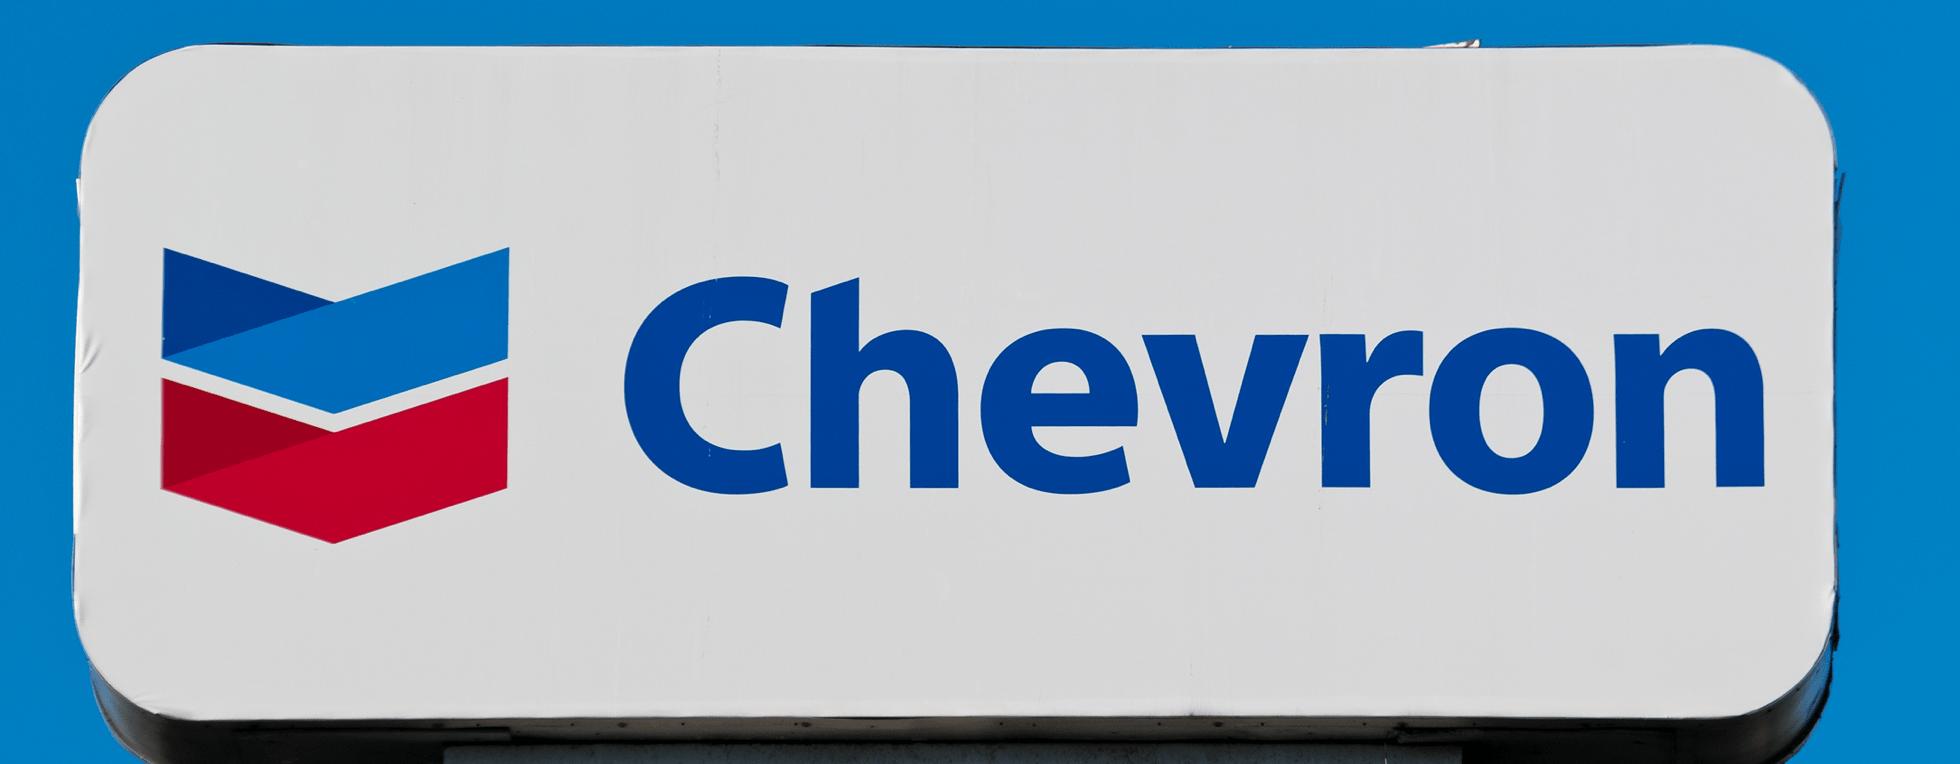 Chevron announces new hydrogen collaboration